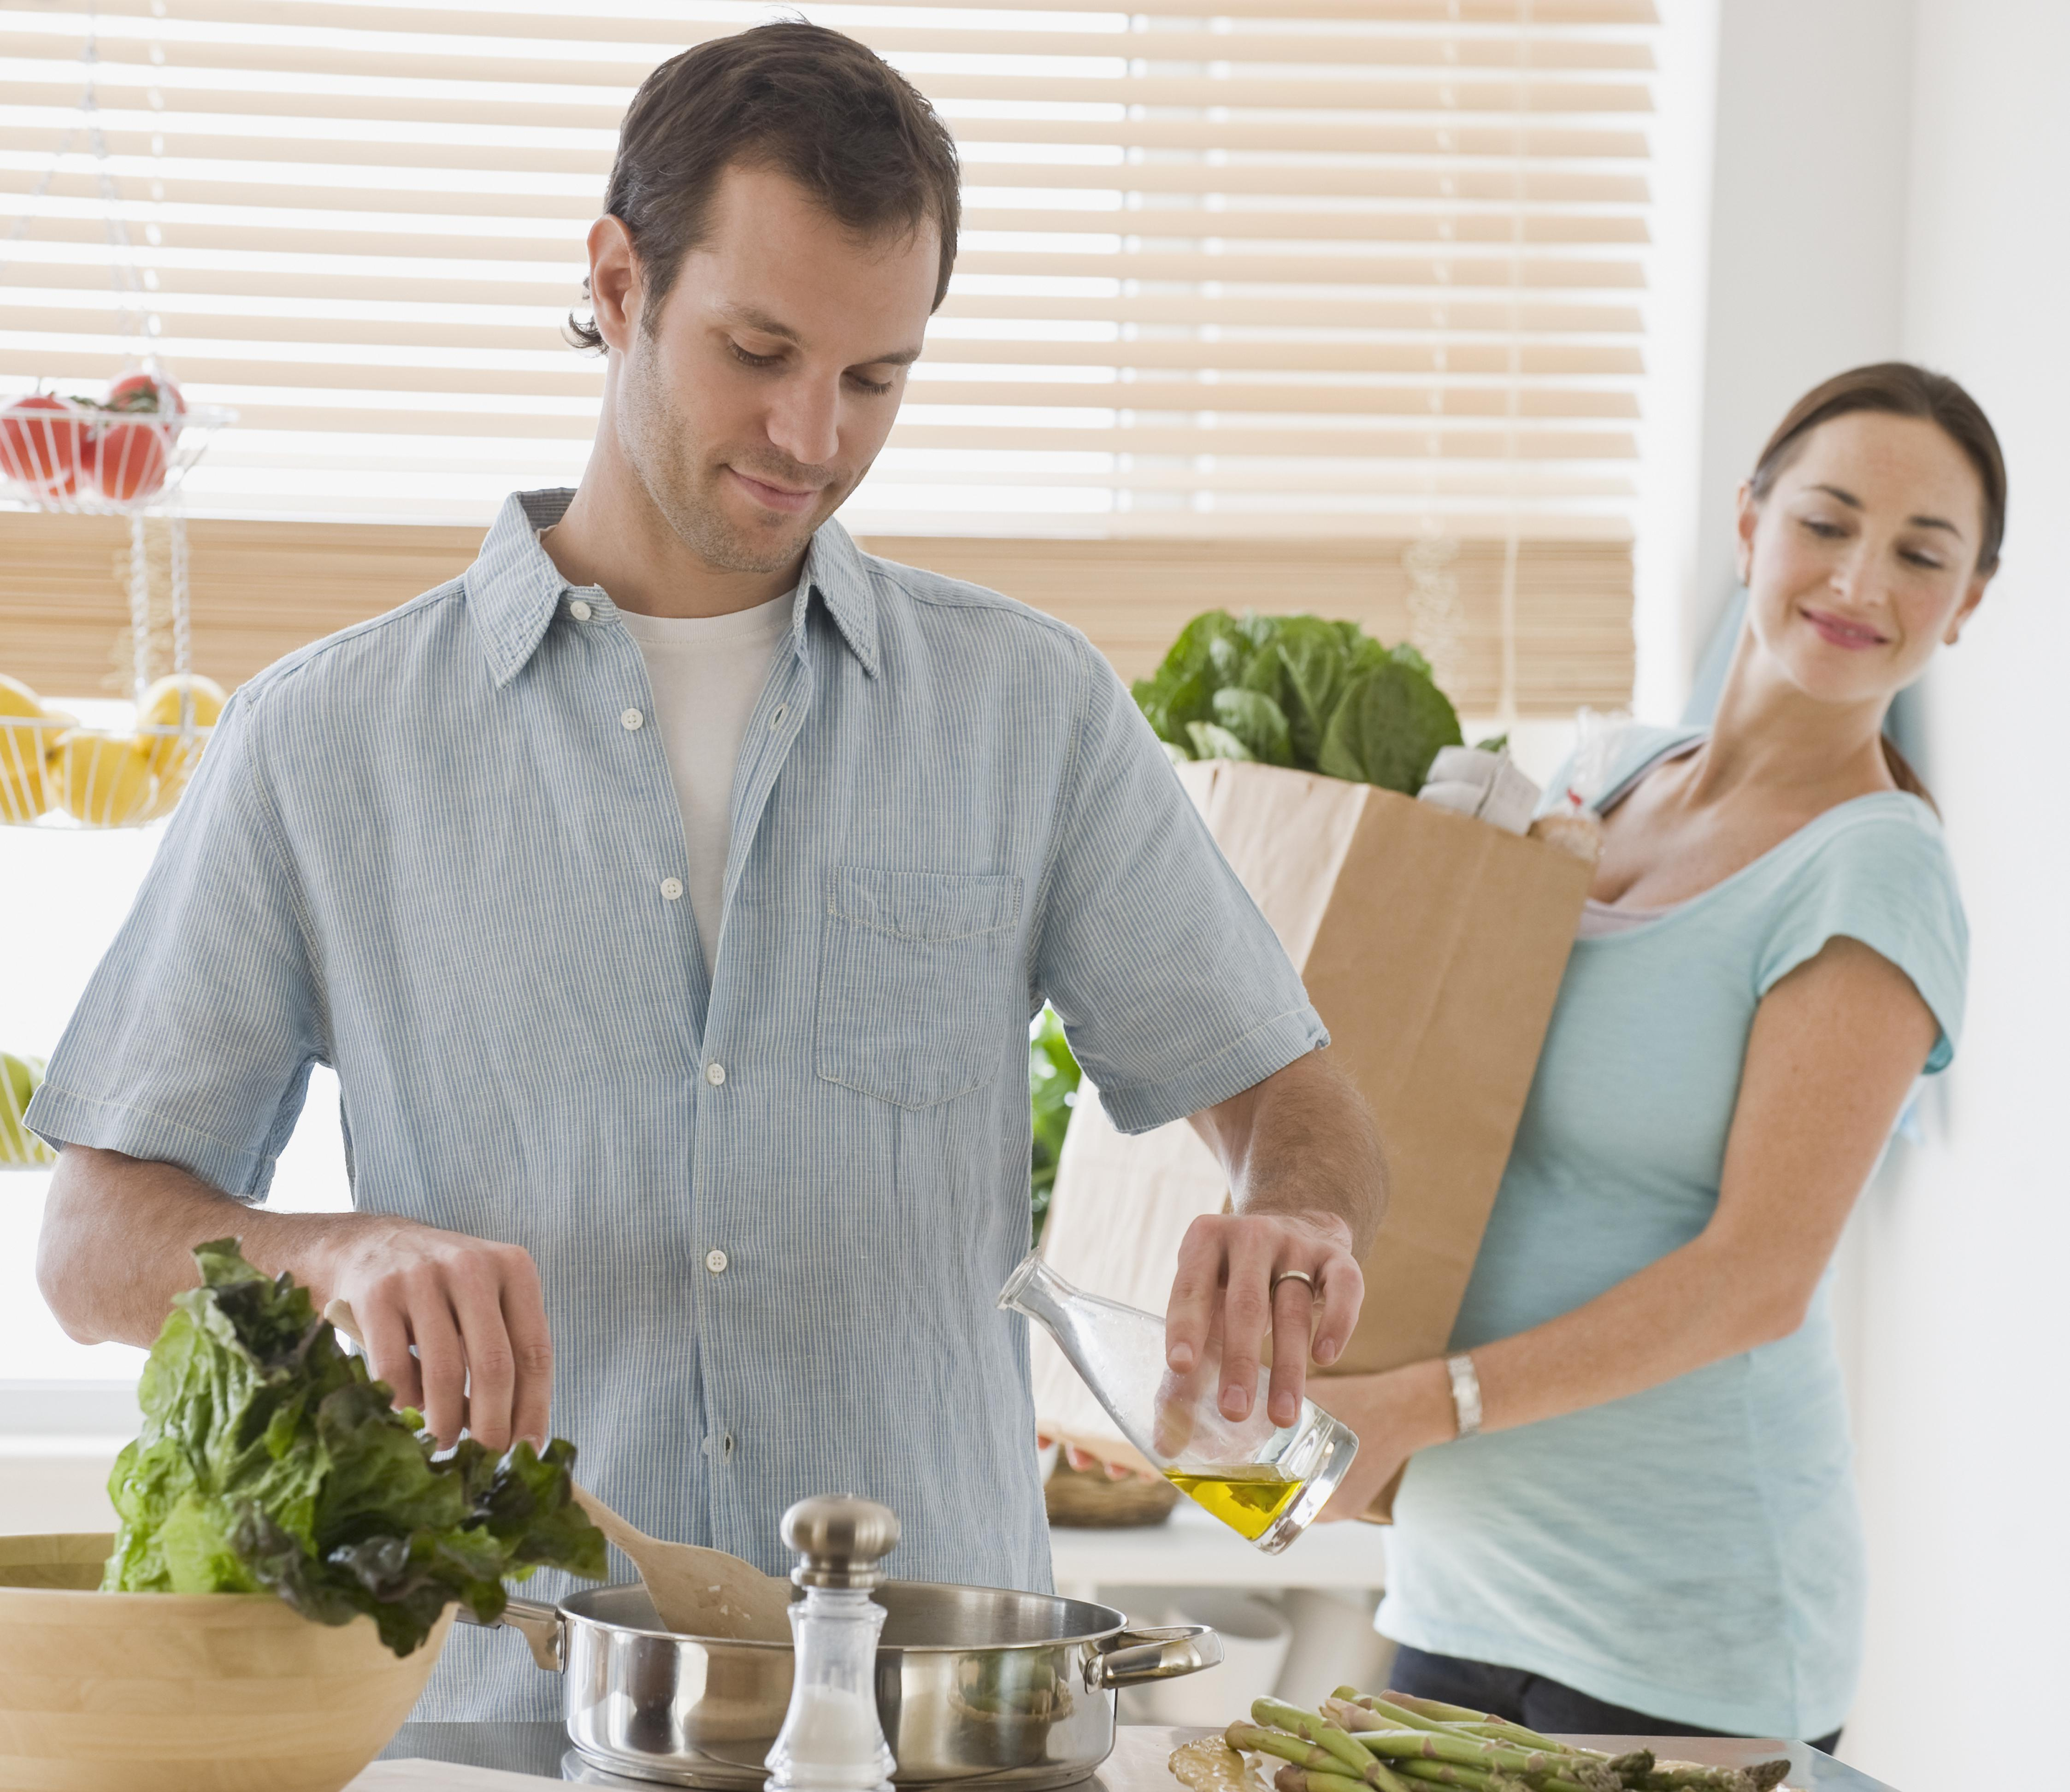 Hispanic couple preparing food